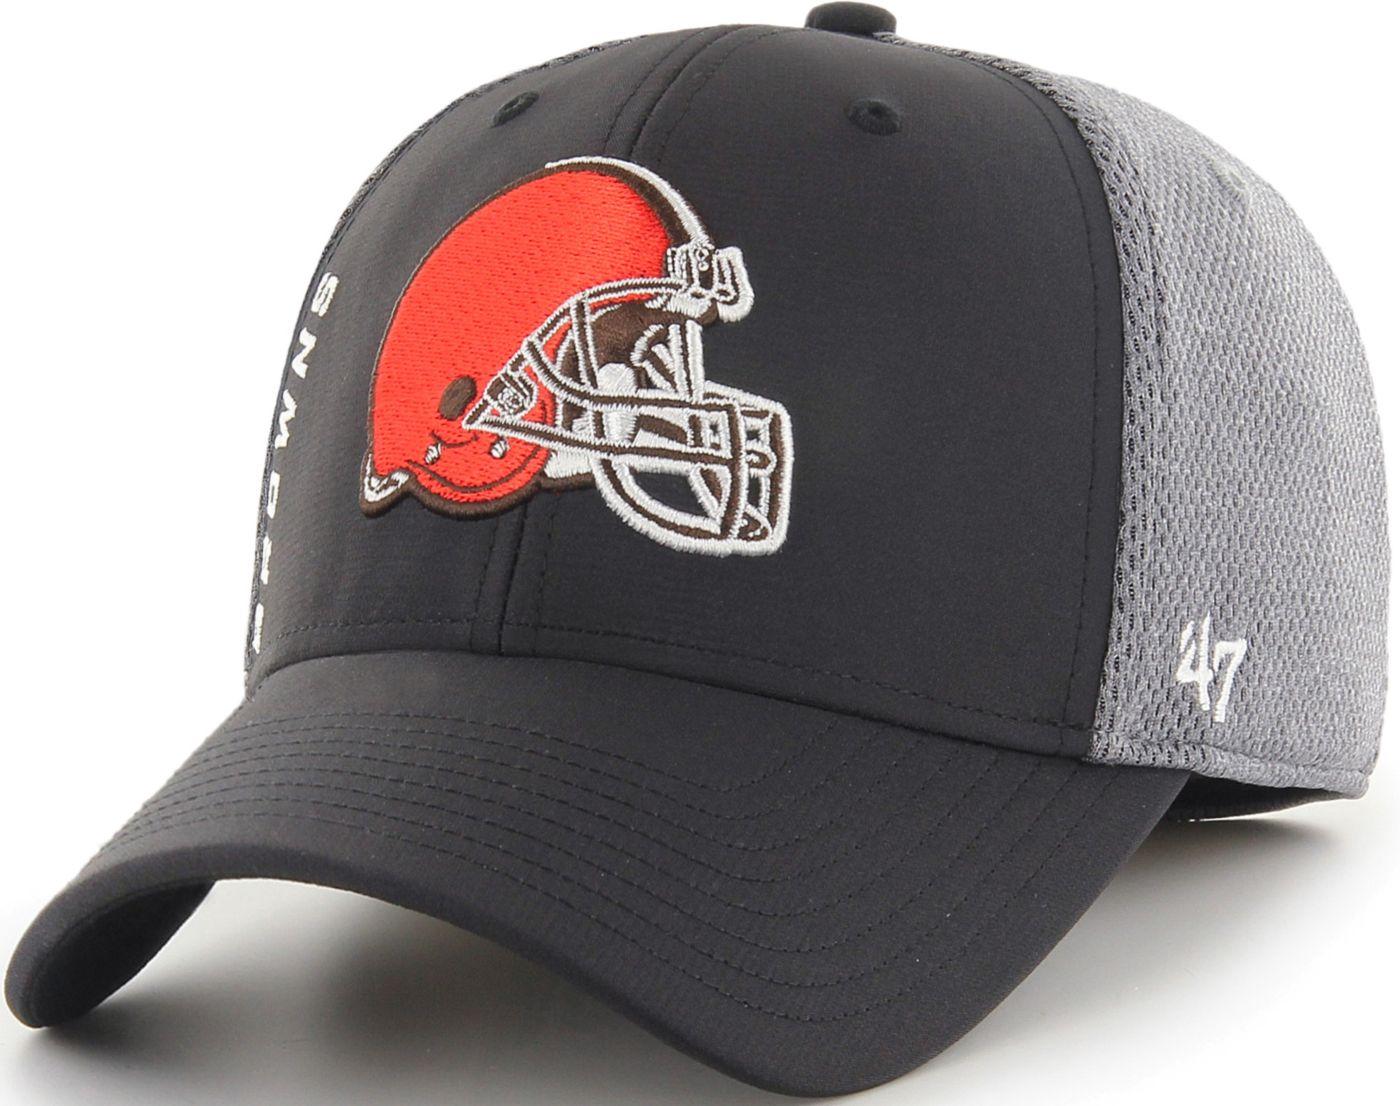 '47 Men's Cleveland Browns Wycliff Contender Stretch Fit Black Hat